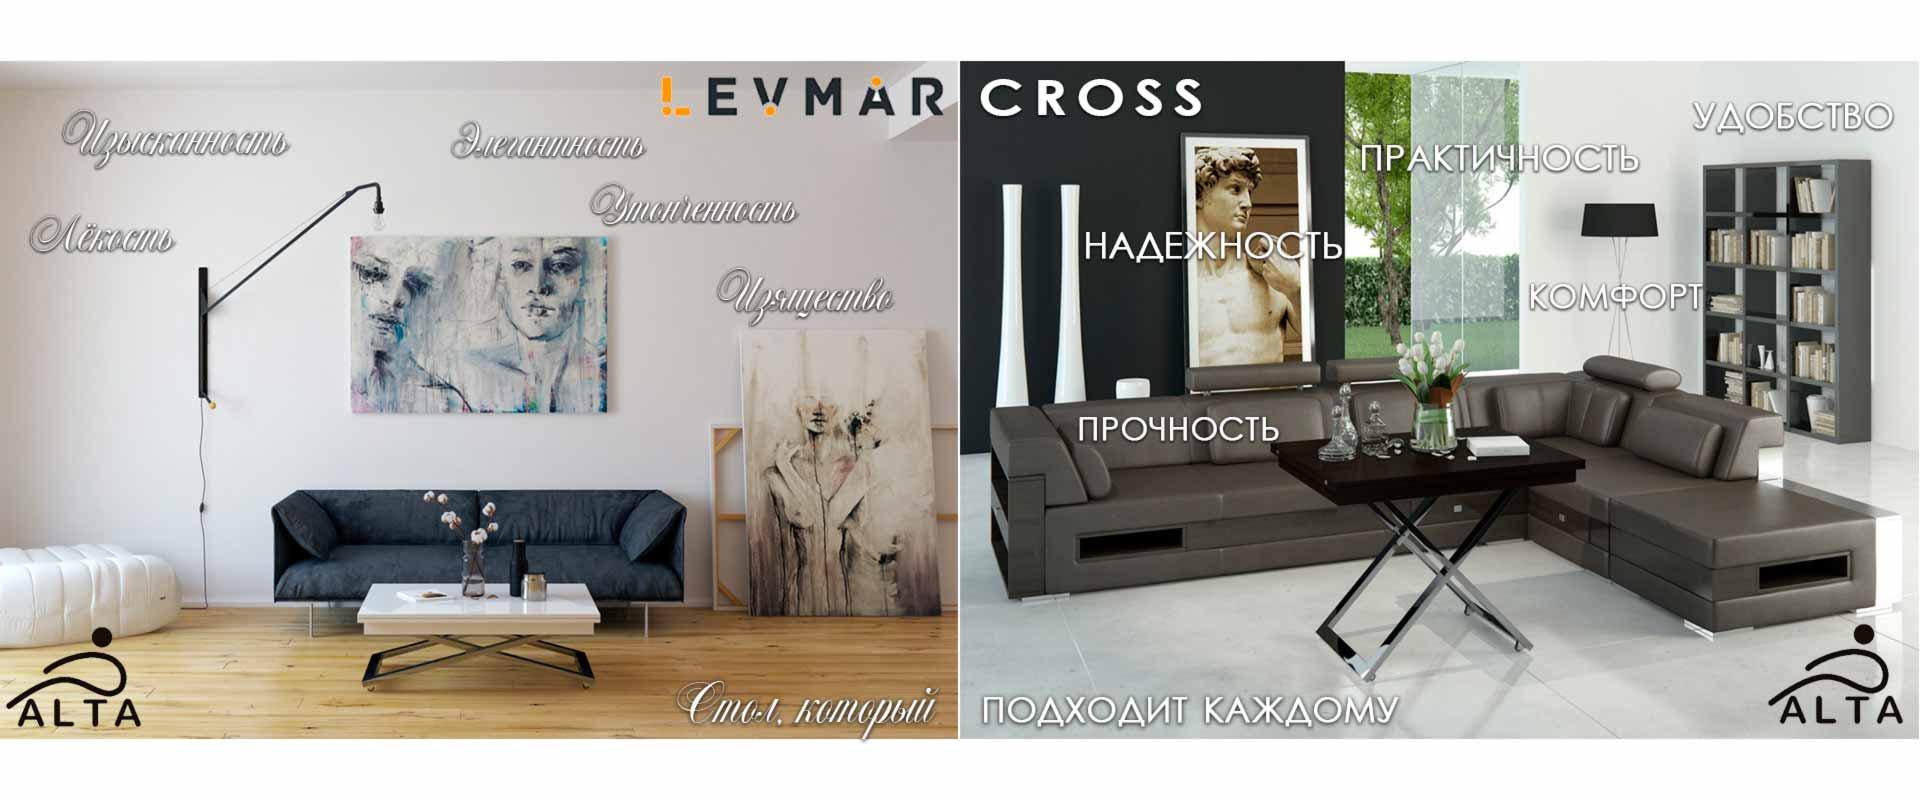 Levmar Cross